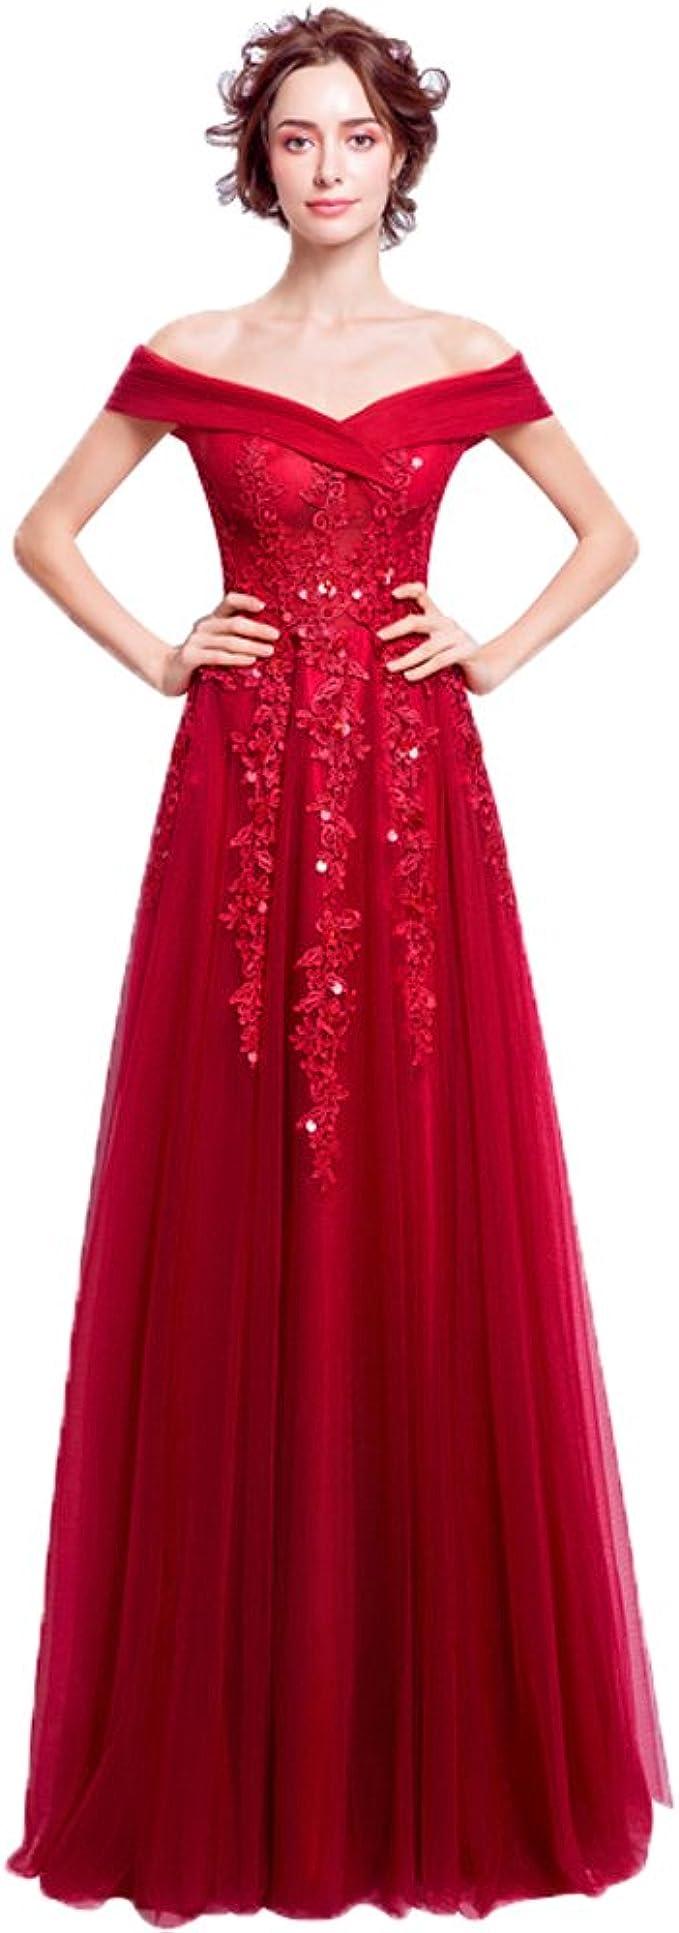 nymph Damen Ärmellos aus Schulter Lang Ballkleid Abendkleider Rot